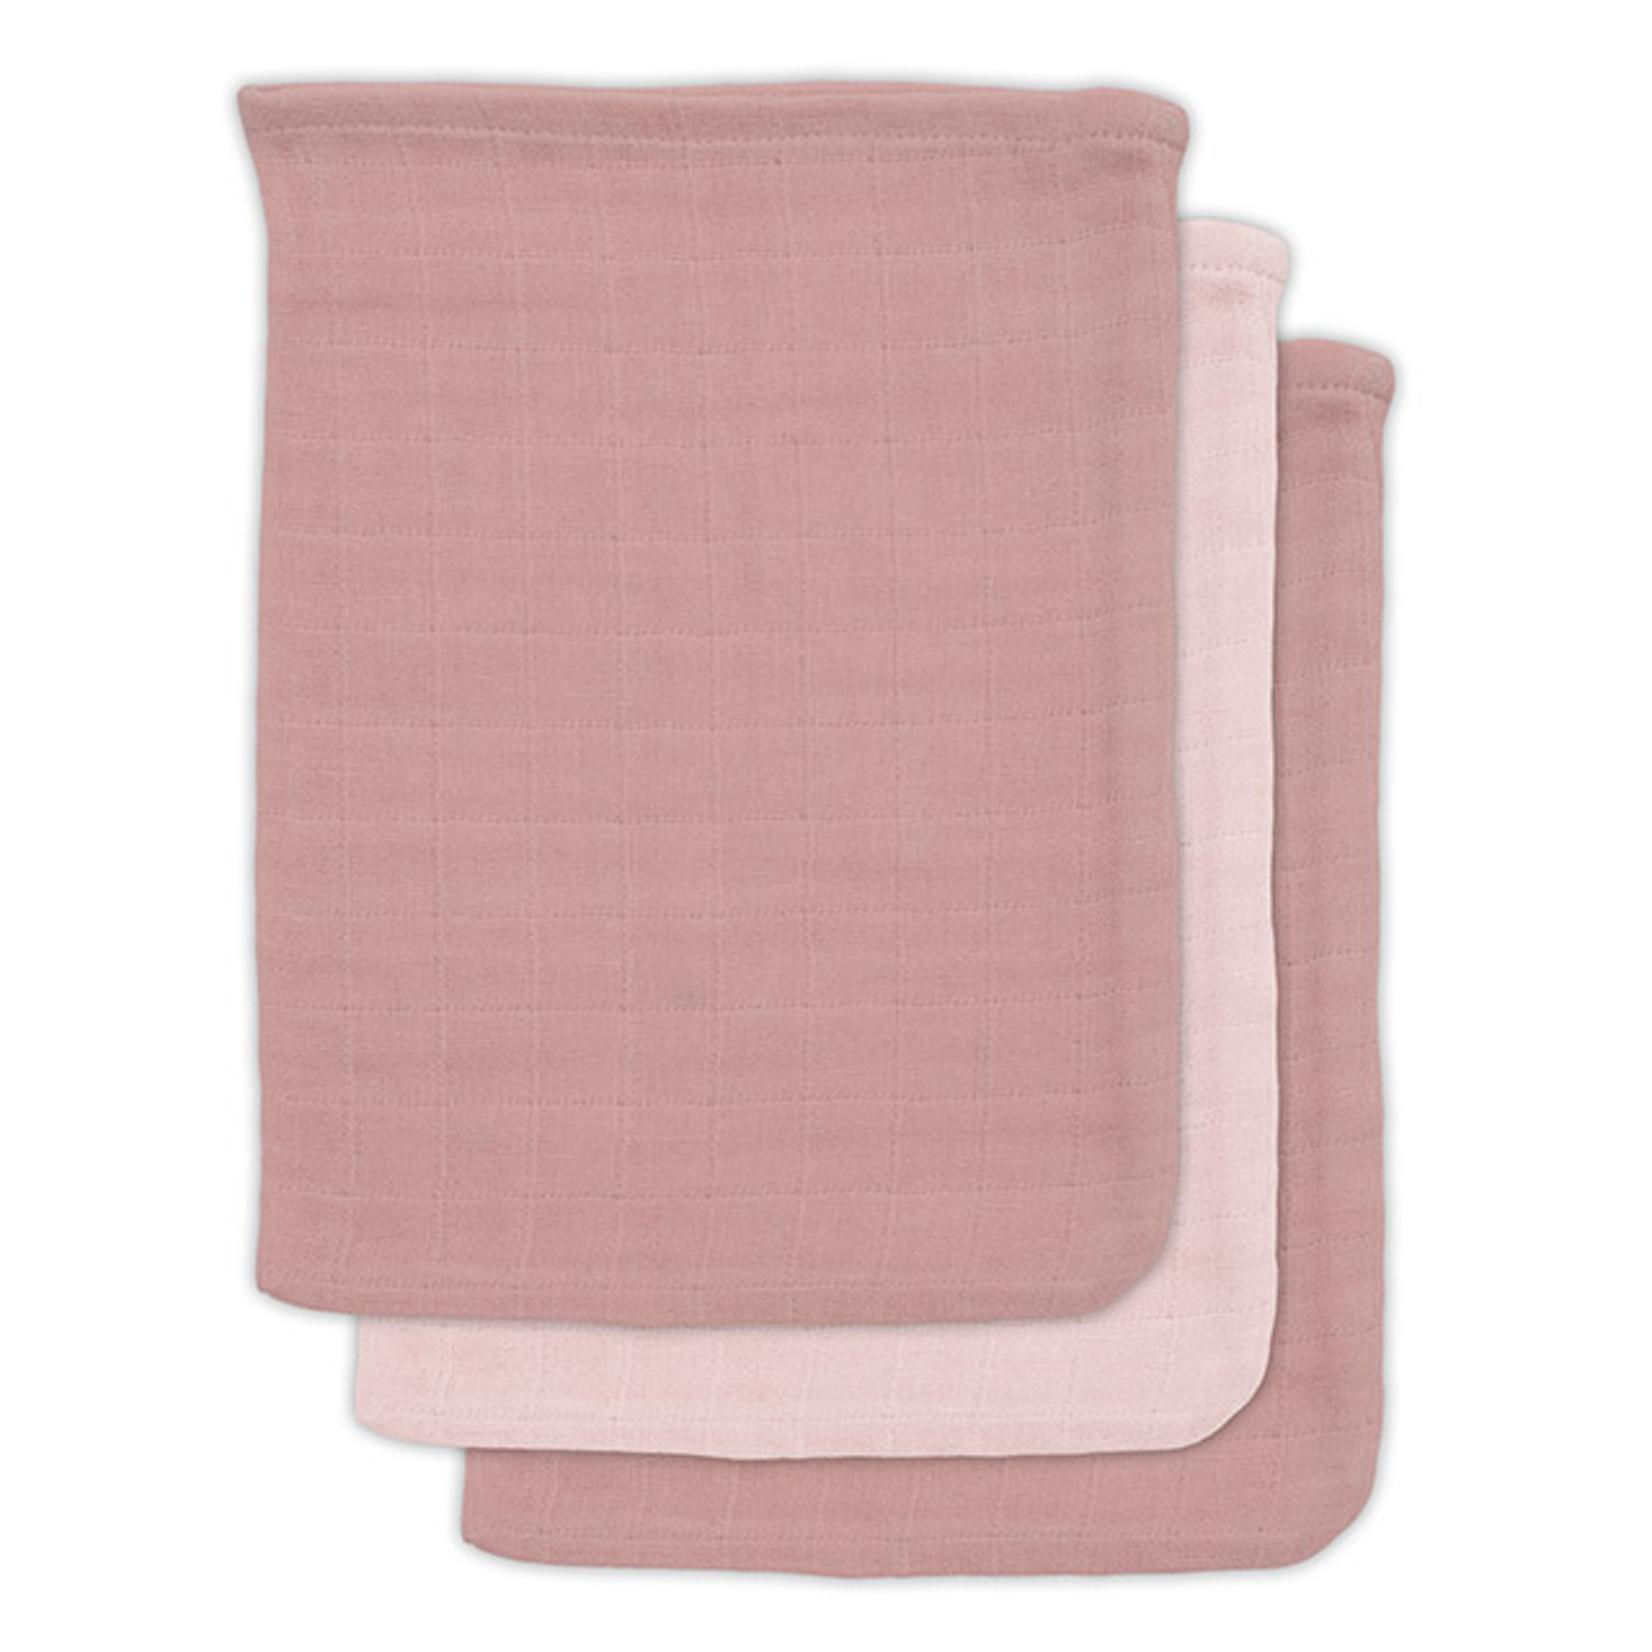 Jollein Jollein 3-pack Bamboe Tetra washandjes Pale pink